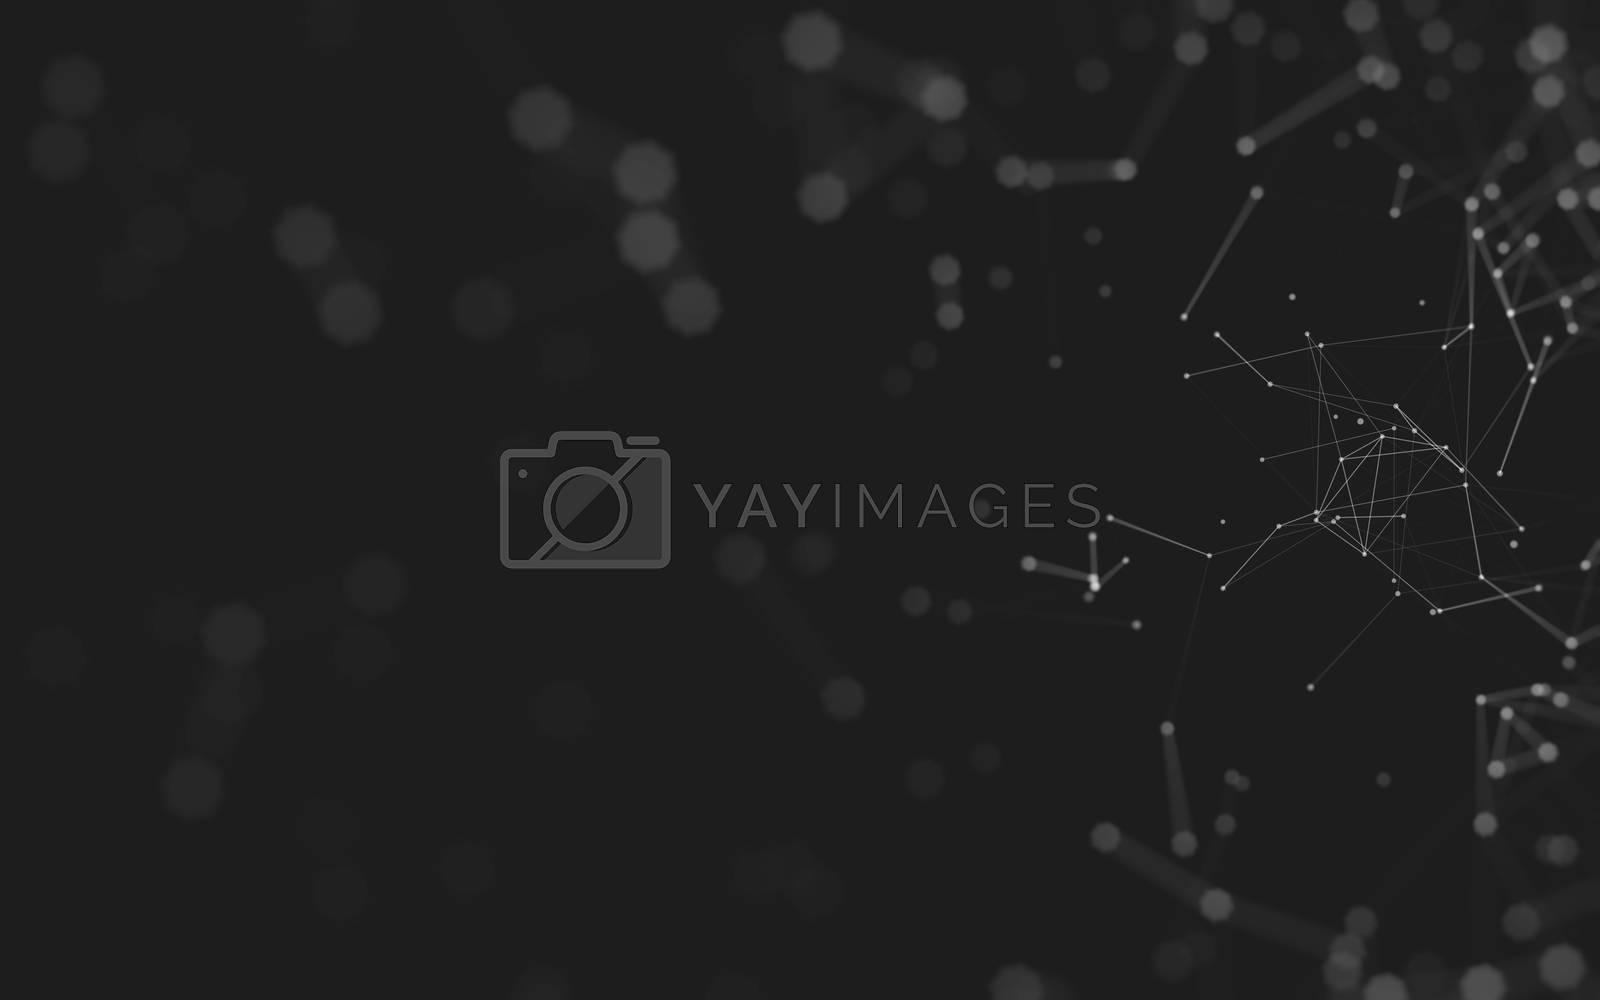 Abstract polygonal space low poly dark background, 3d rendering by Teerawit Tj-rabbit